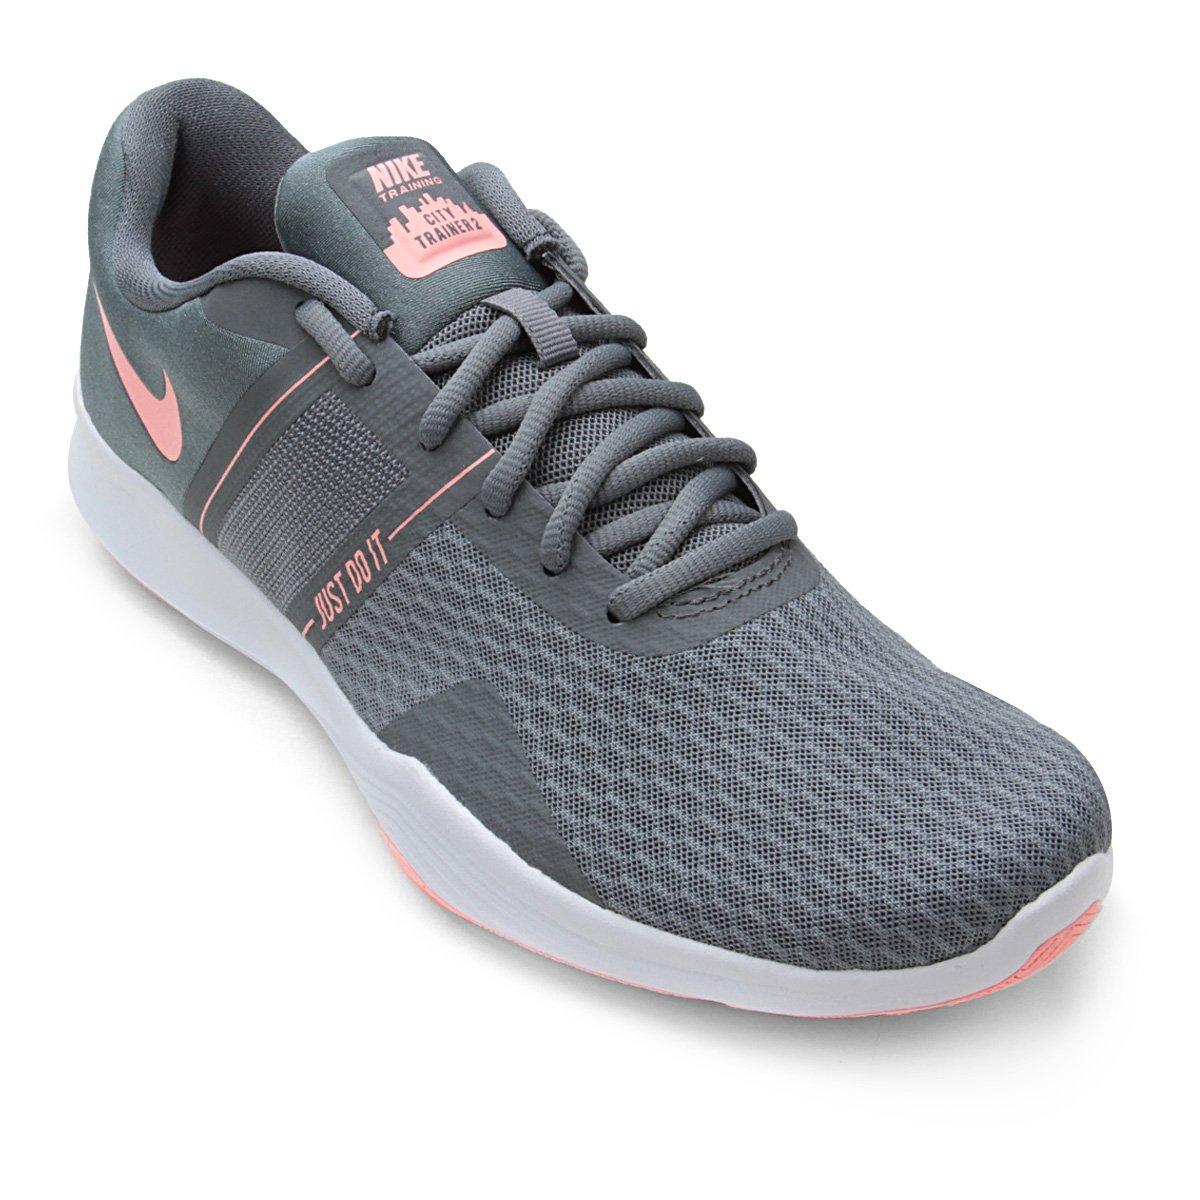 Tênis Nike City Trainer 2 Feminino Cinza E Rosa